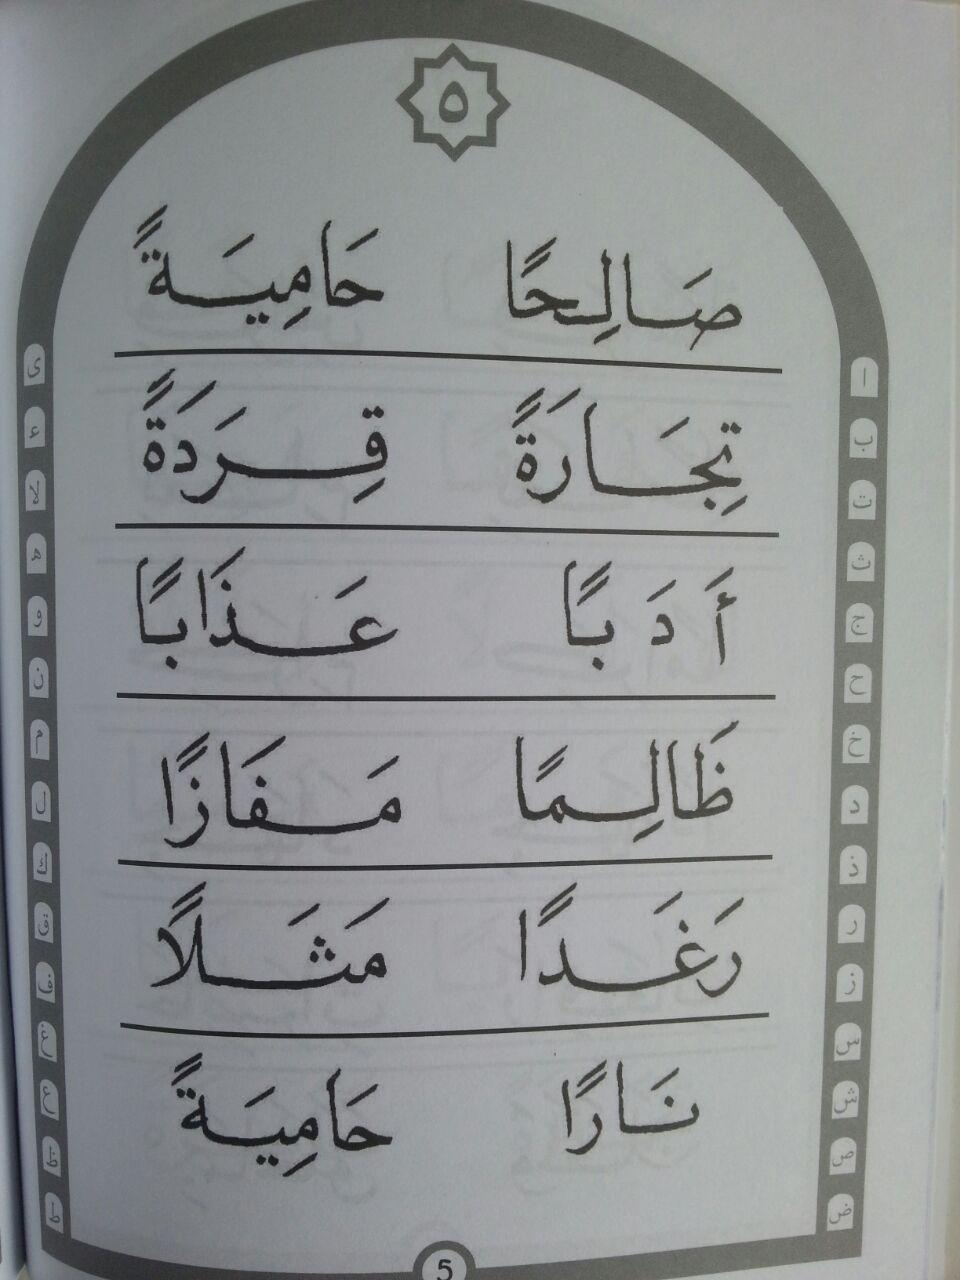 Buku Kibar Cara Cepat Dan Fasih Belajar Membaca Al-Qur'an A5 Set isi